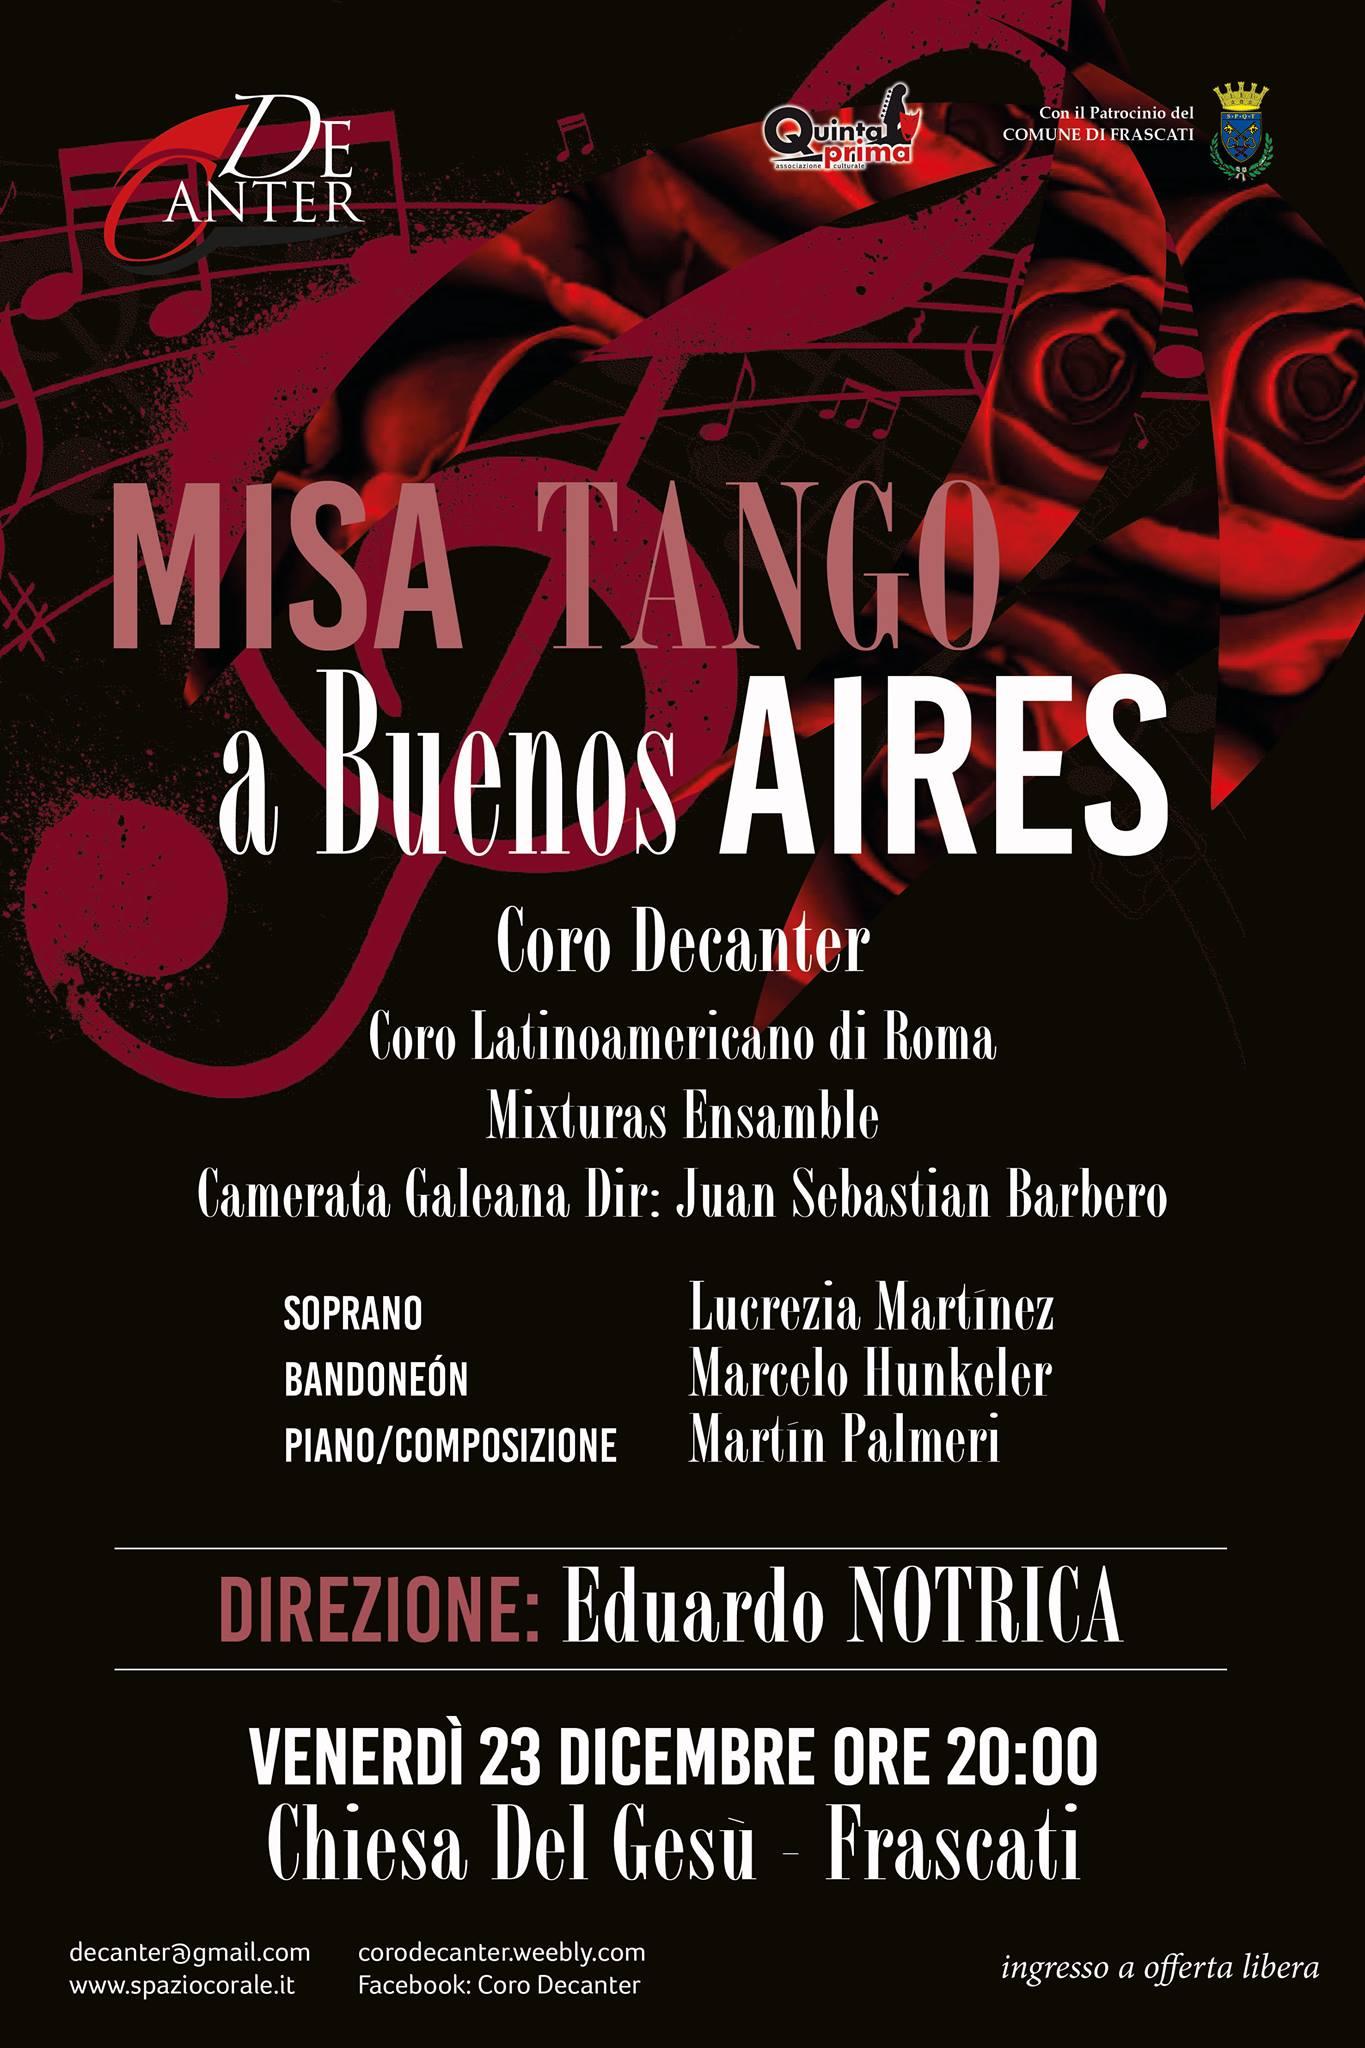 Misa tango - Martin Palmeri